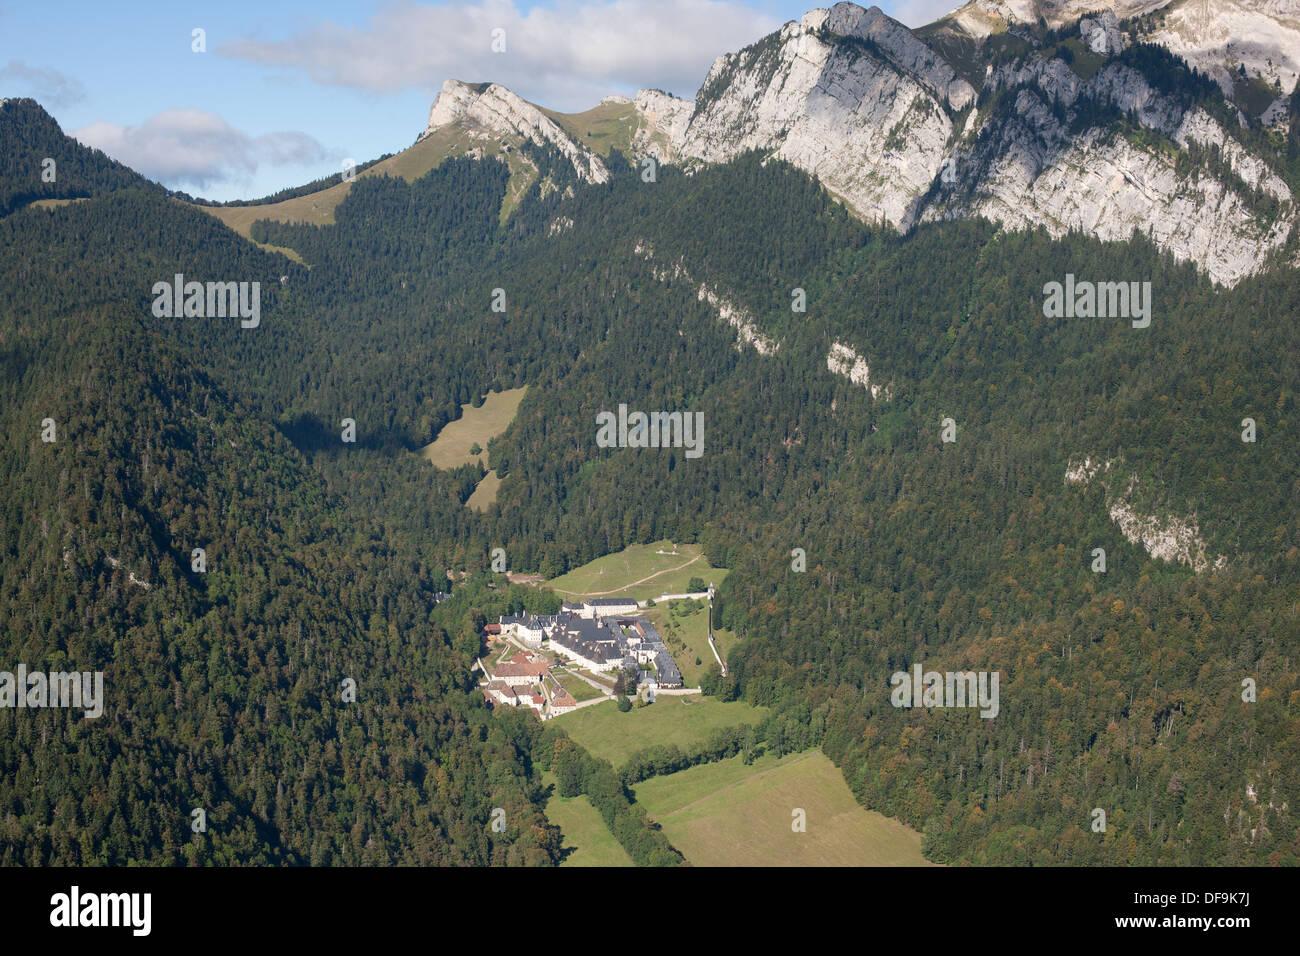 GRANDE CHARTREUSE MONASTERY (aerial view). Saint-Pierre-de-Chartreuse, Isère, Rhône-Alpes, France. - Stock Image